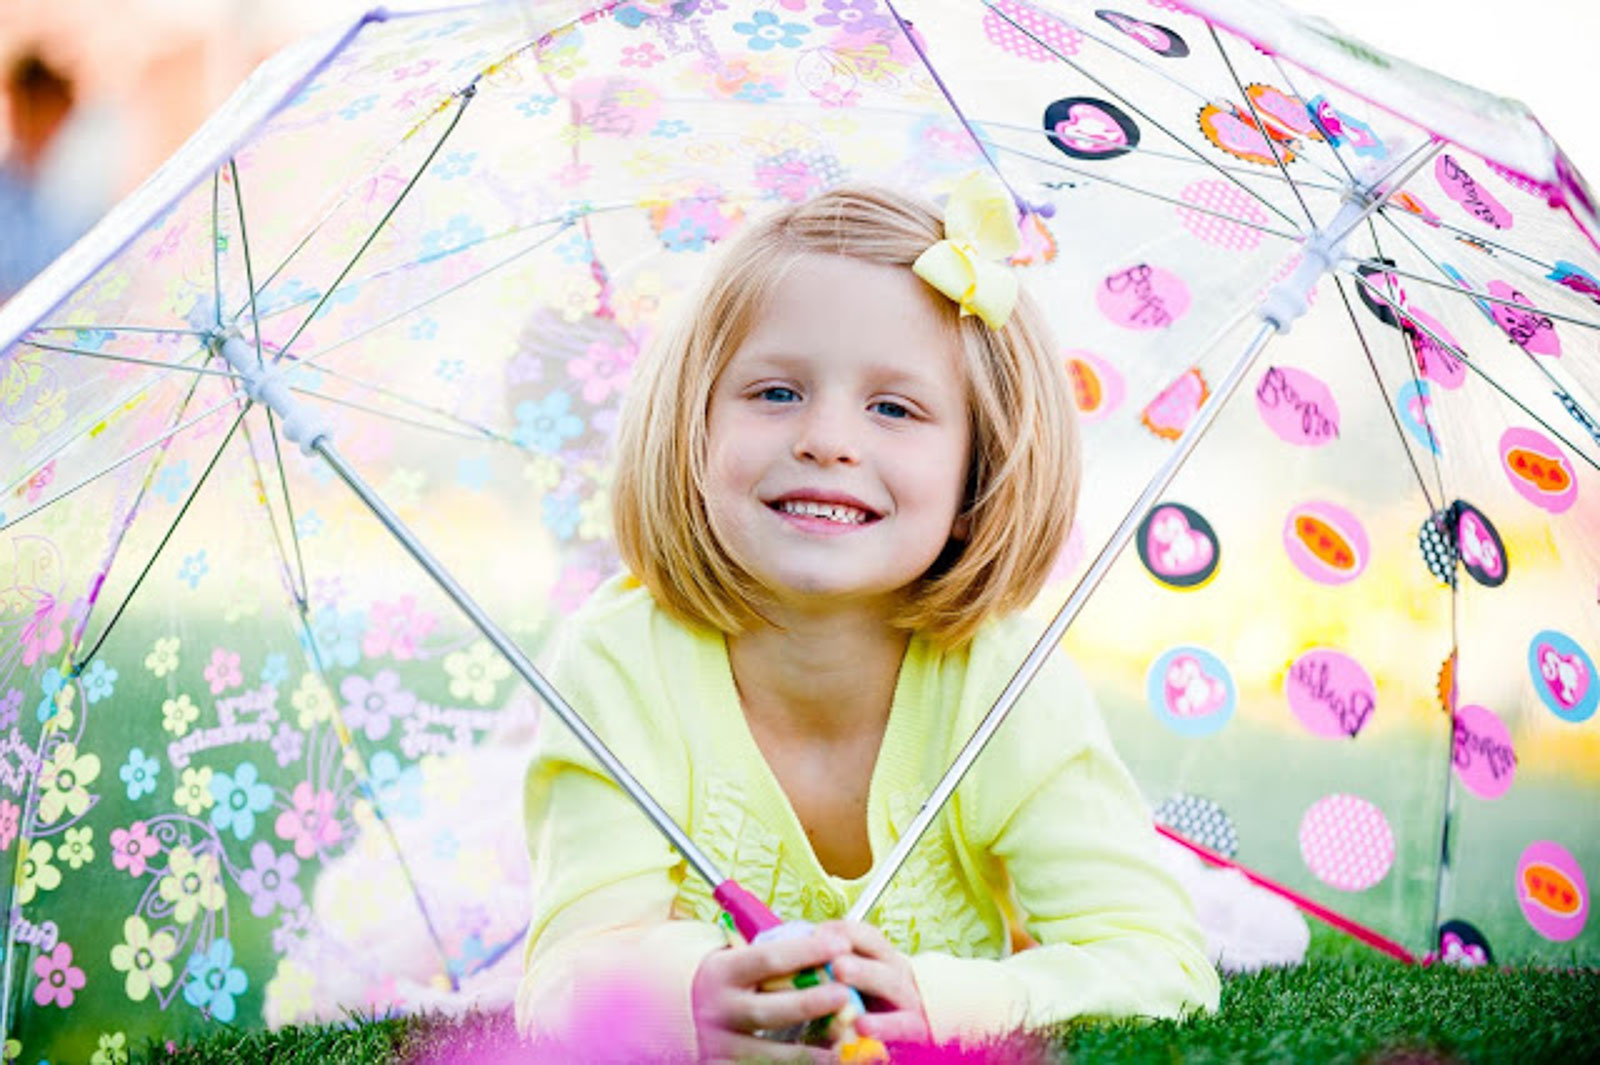 girl children under umbrella oahu beach portrait photo